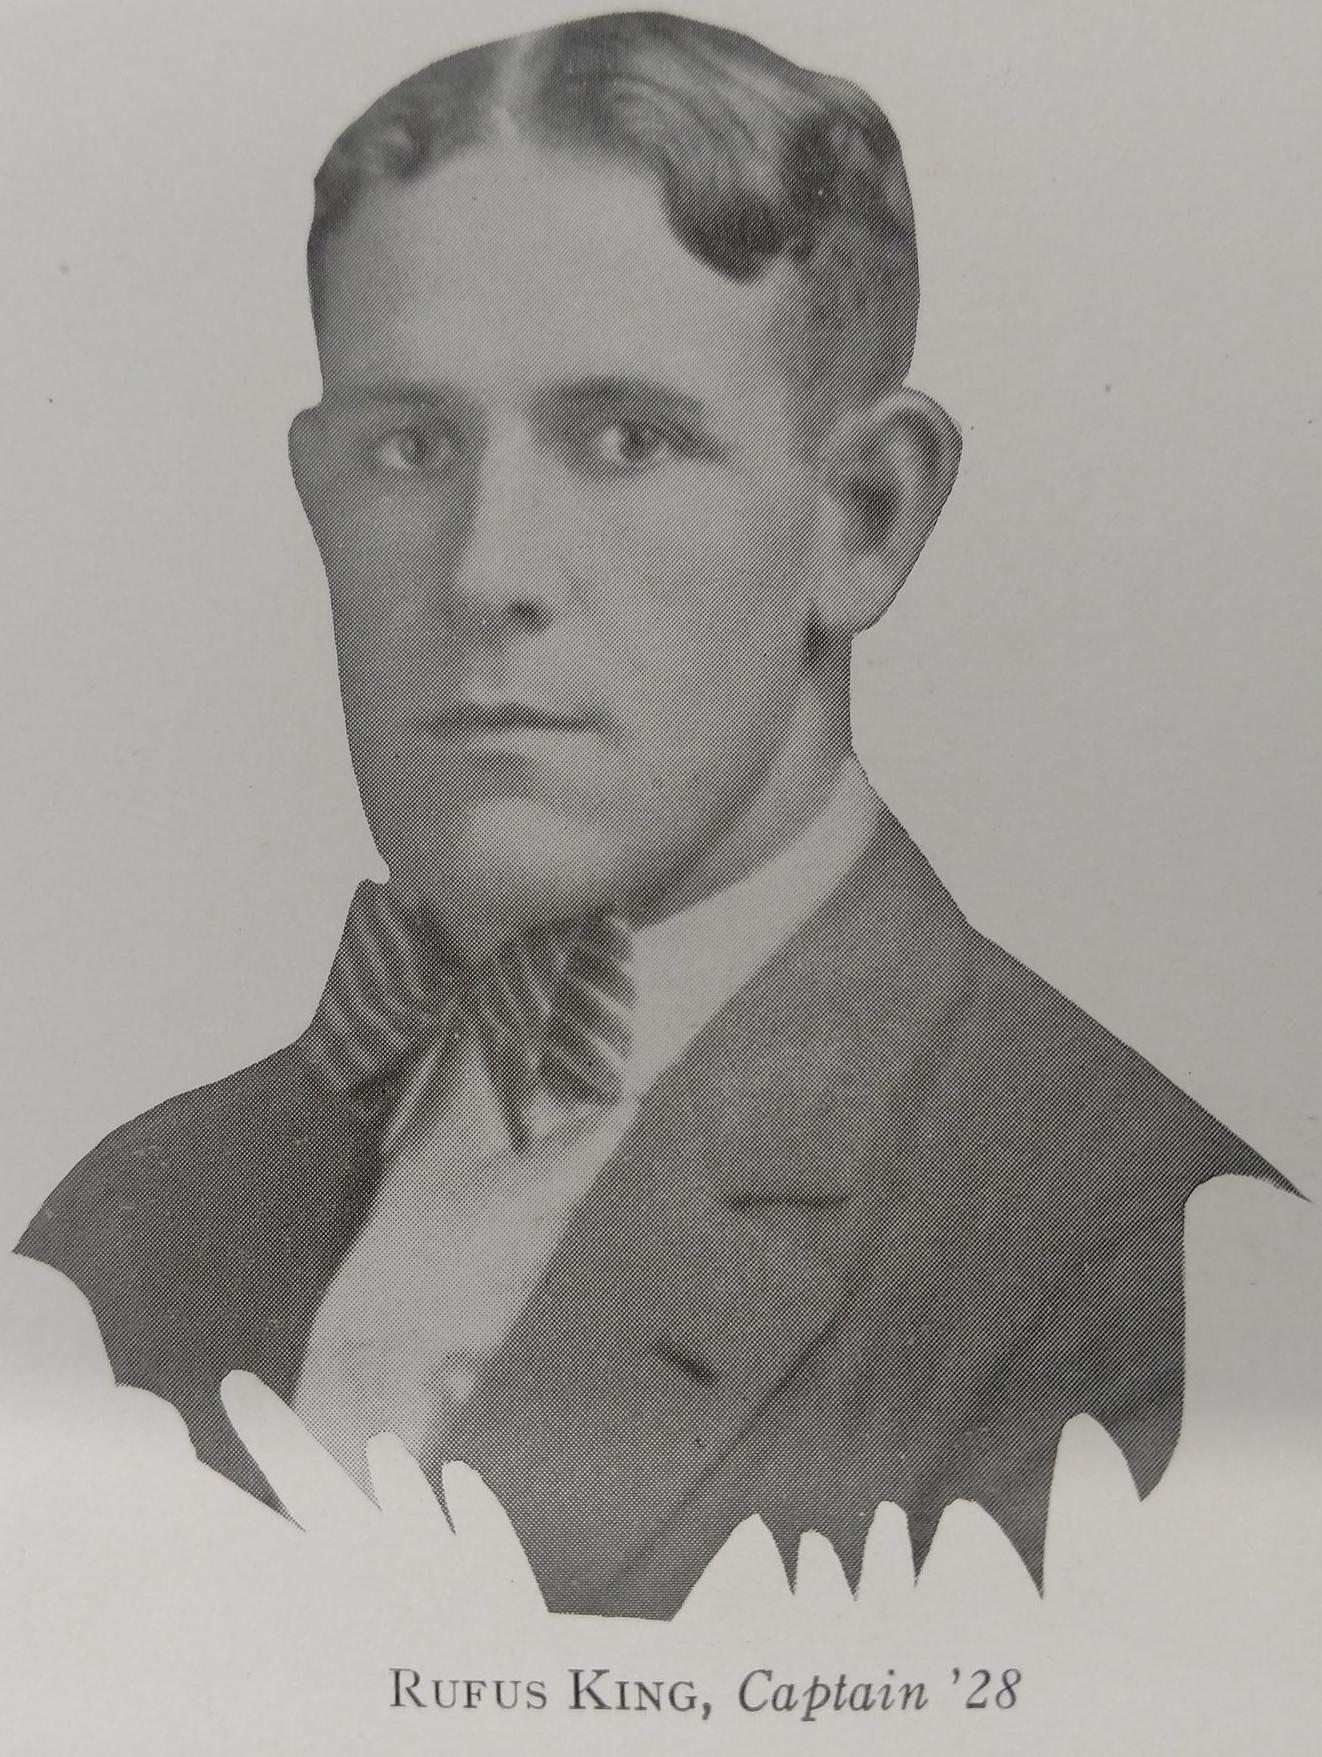 Rufus King captain